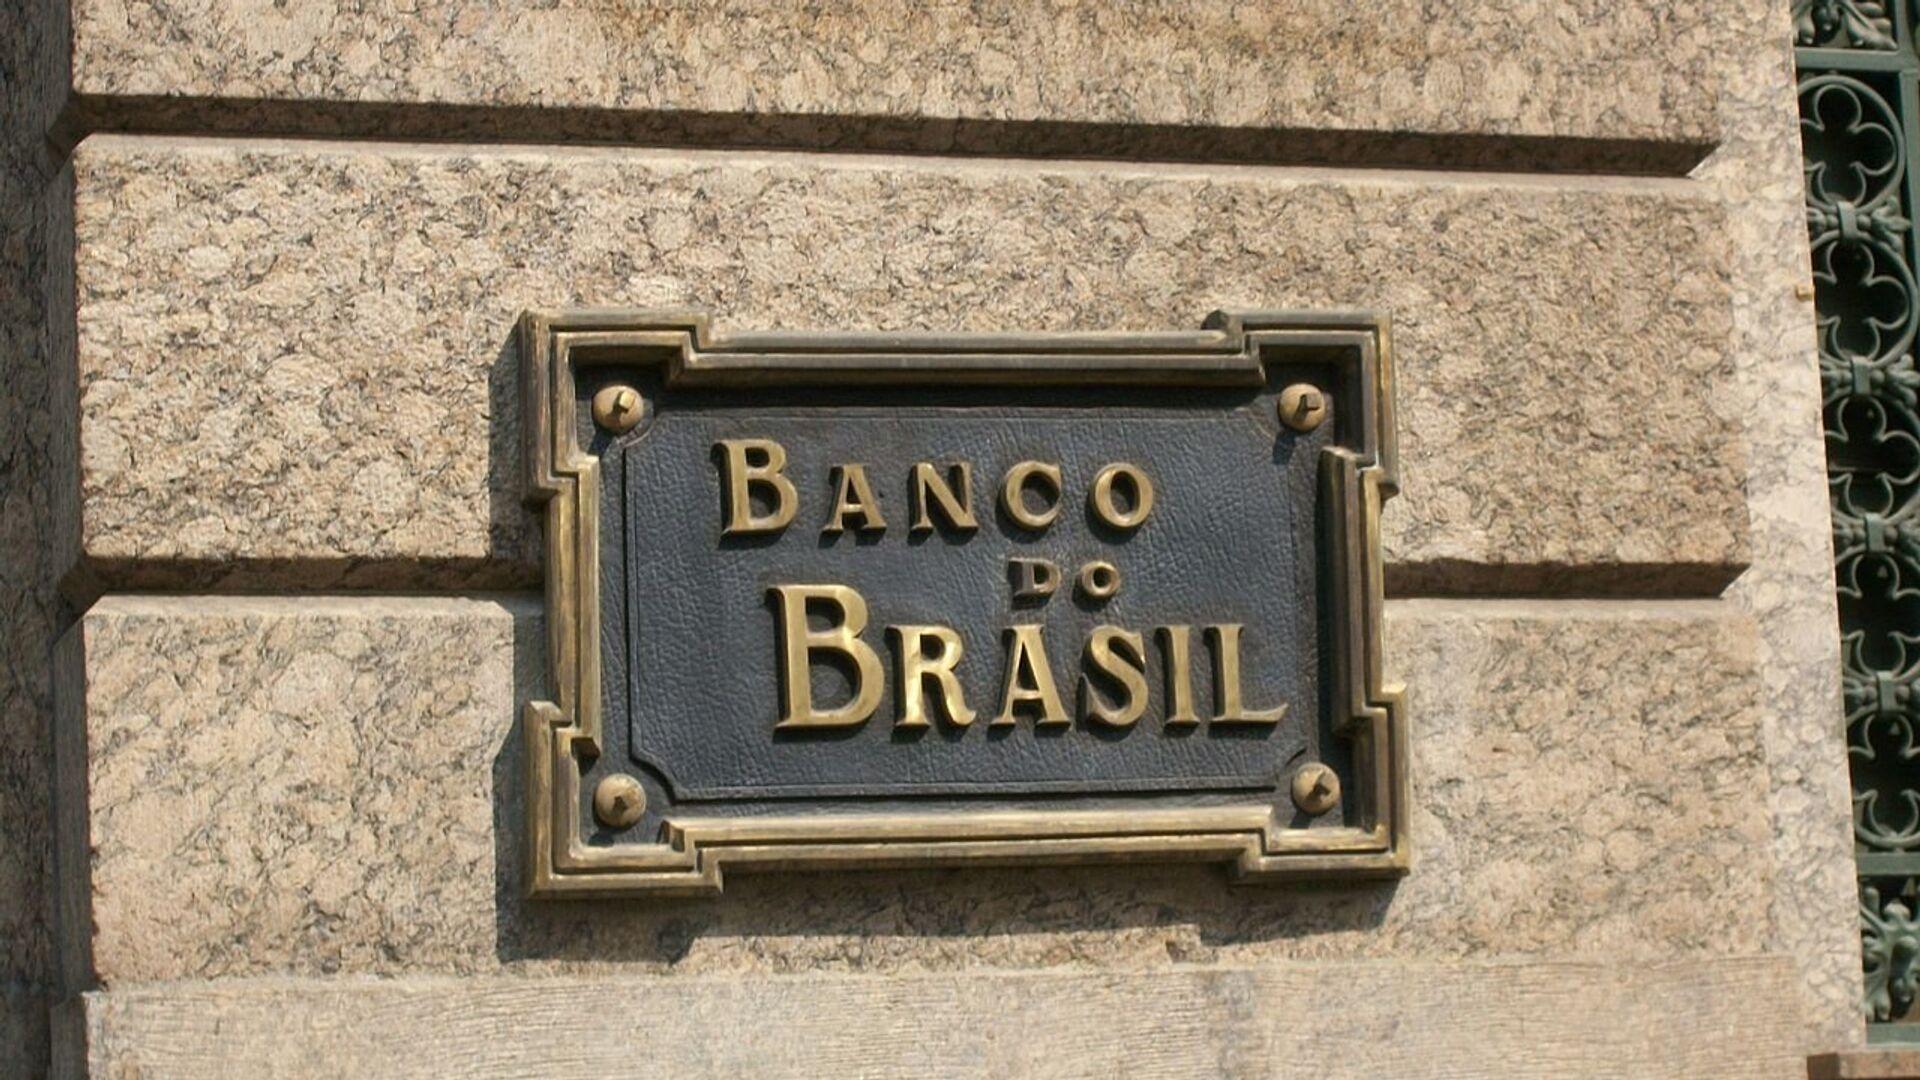 Banco de Brasil - Sputnik Mundo, 1920, 18.03.2021